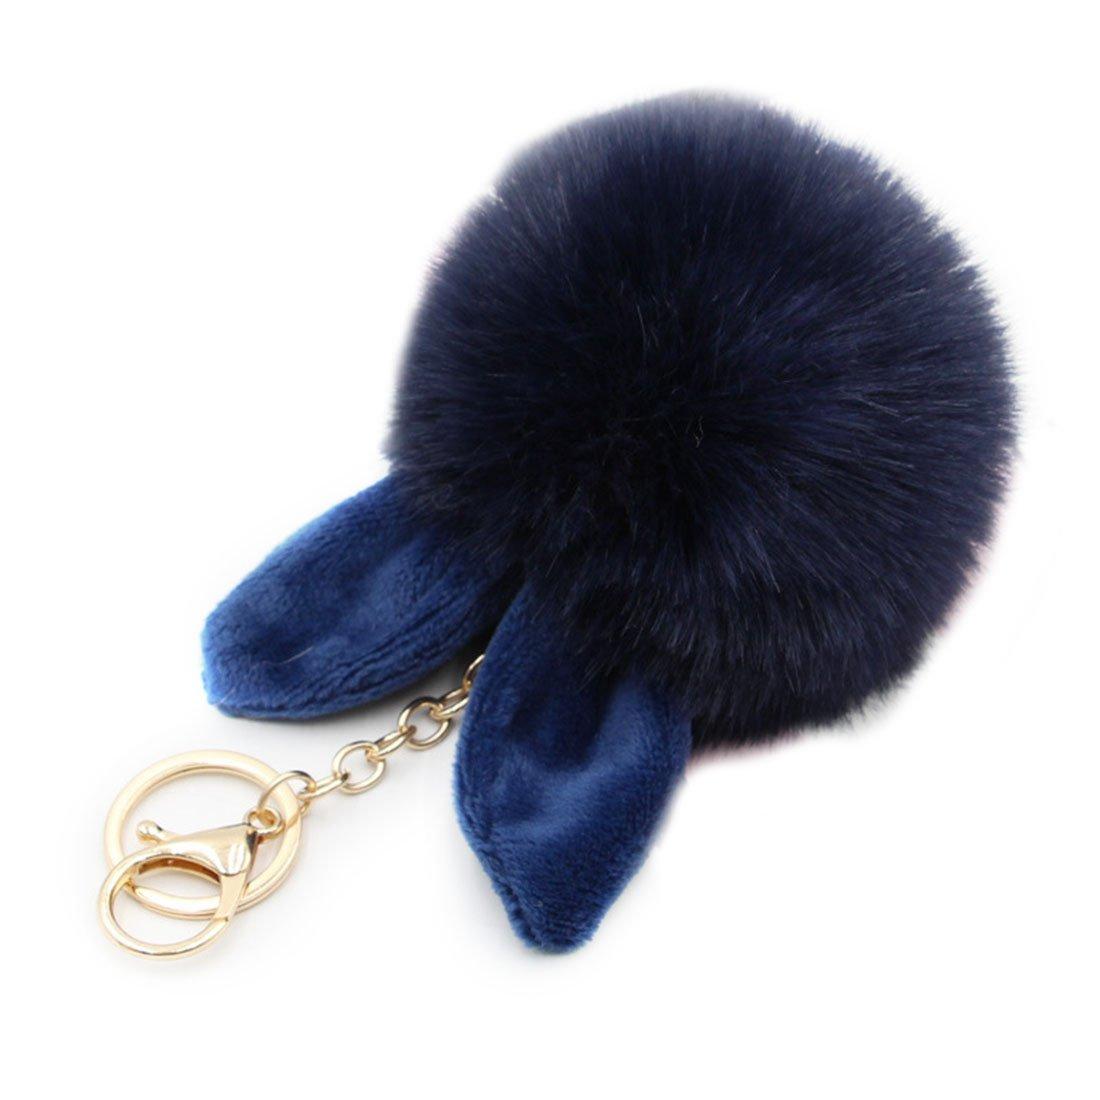 URSFUR 2PCS Faux Pom Pom Balls Keychain- Fluffy Balls for Phones, Rabbit Ear Pendant Keyring Accessories Car Bag Charm